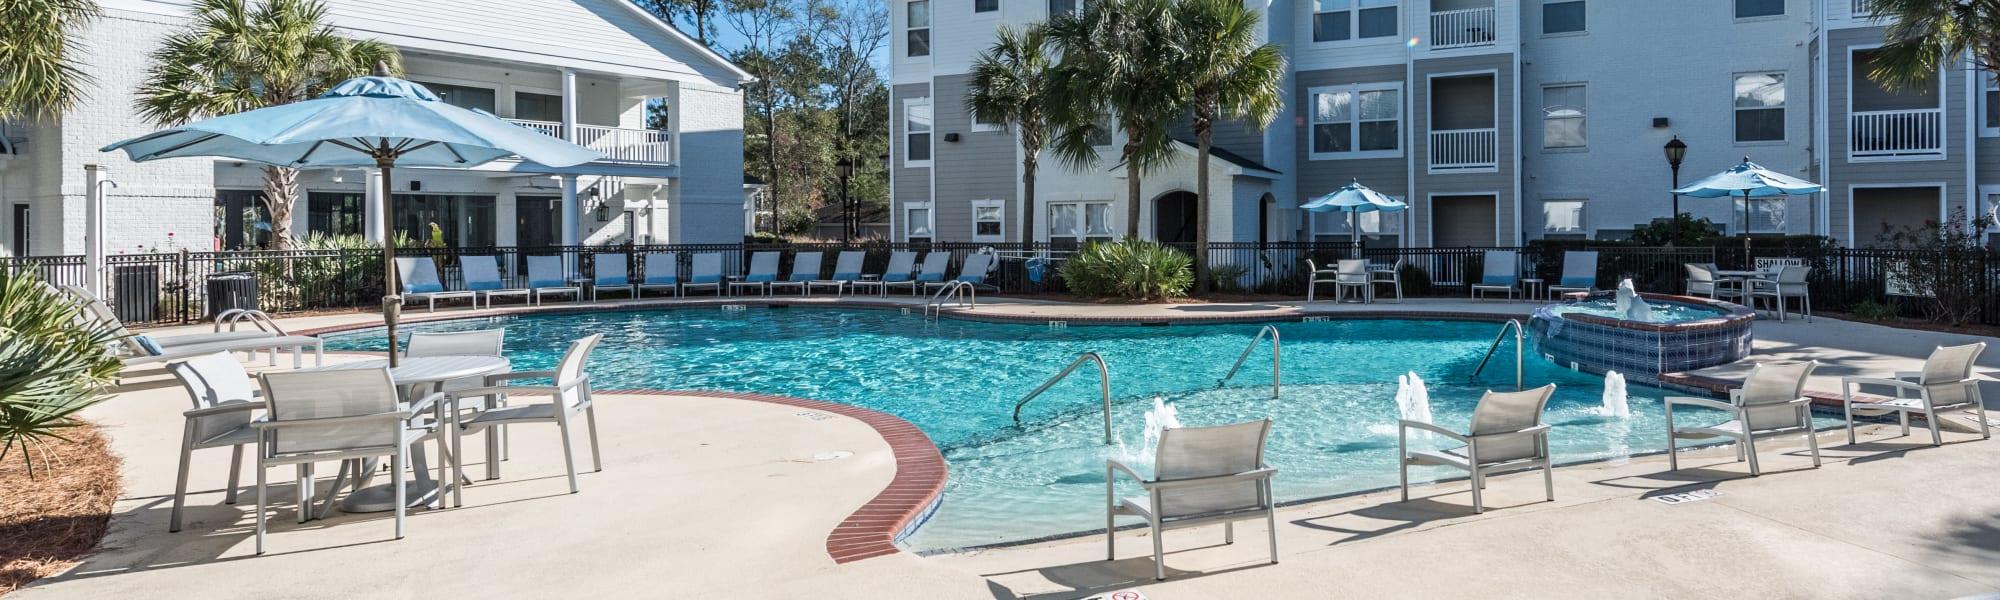 Residents of Ingleside Apartments in North Charleston, South Carolina